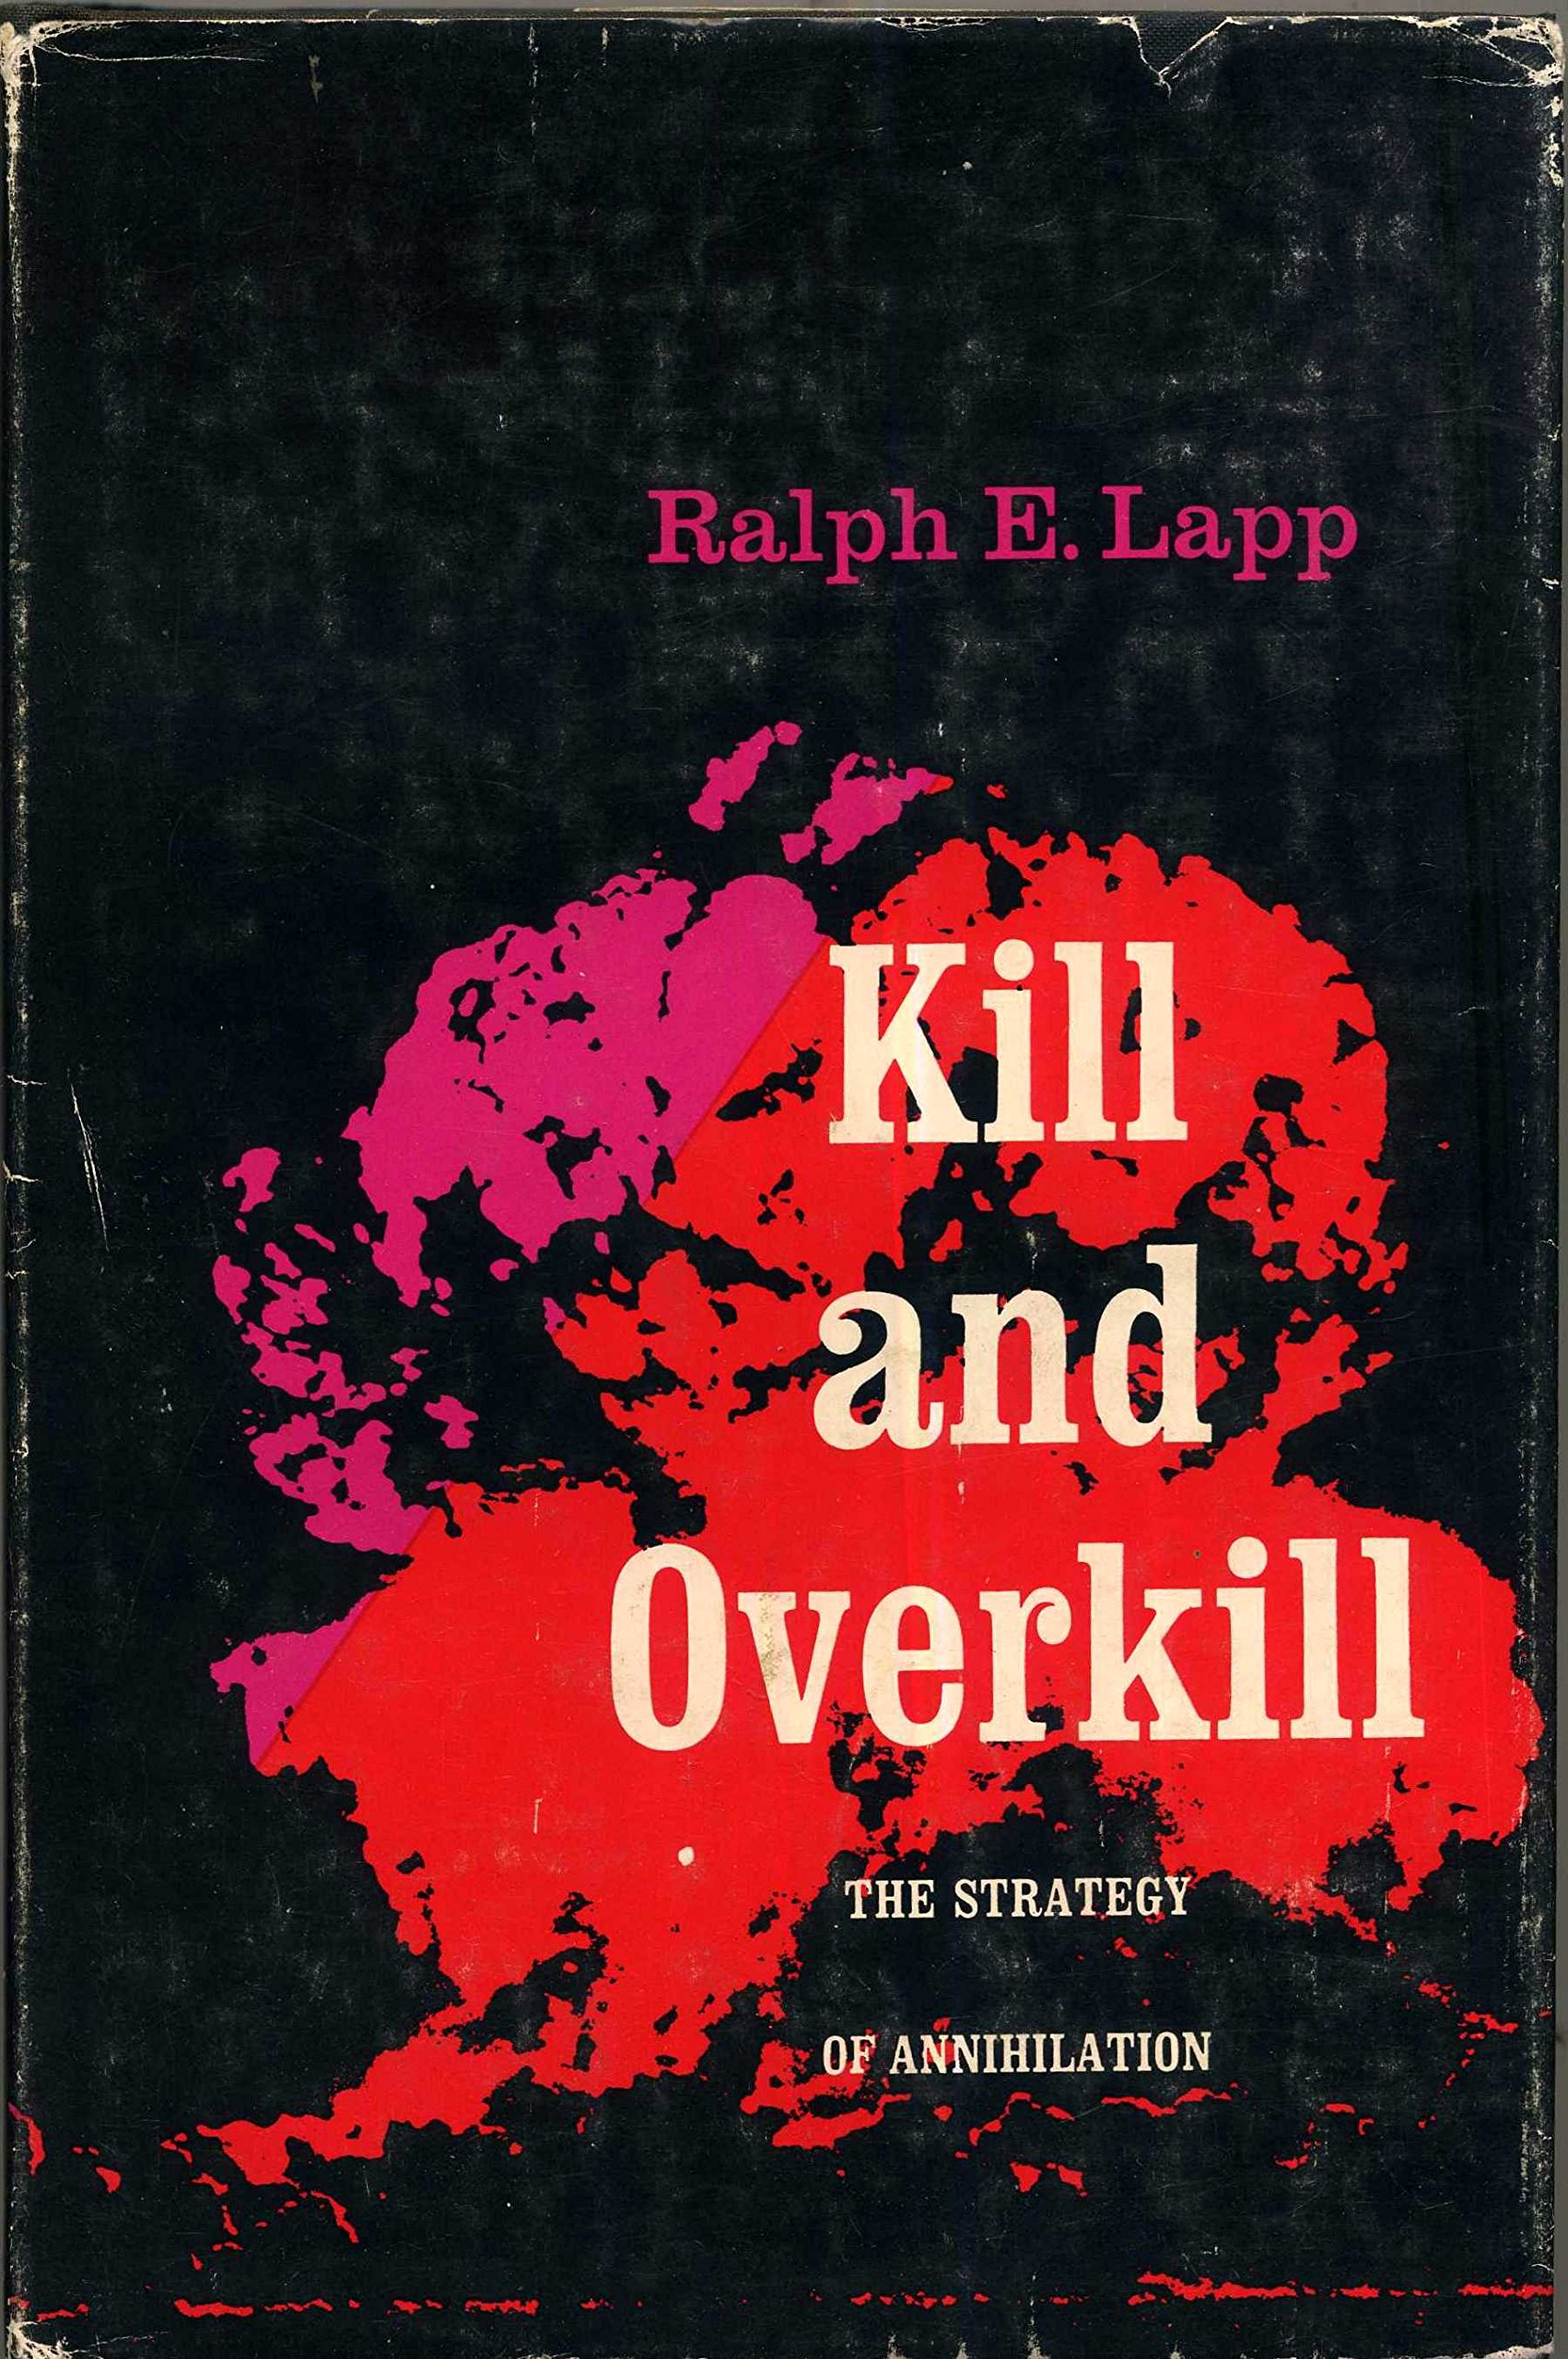 Kill & OverkillKill: The Strategy of Annihilation